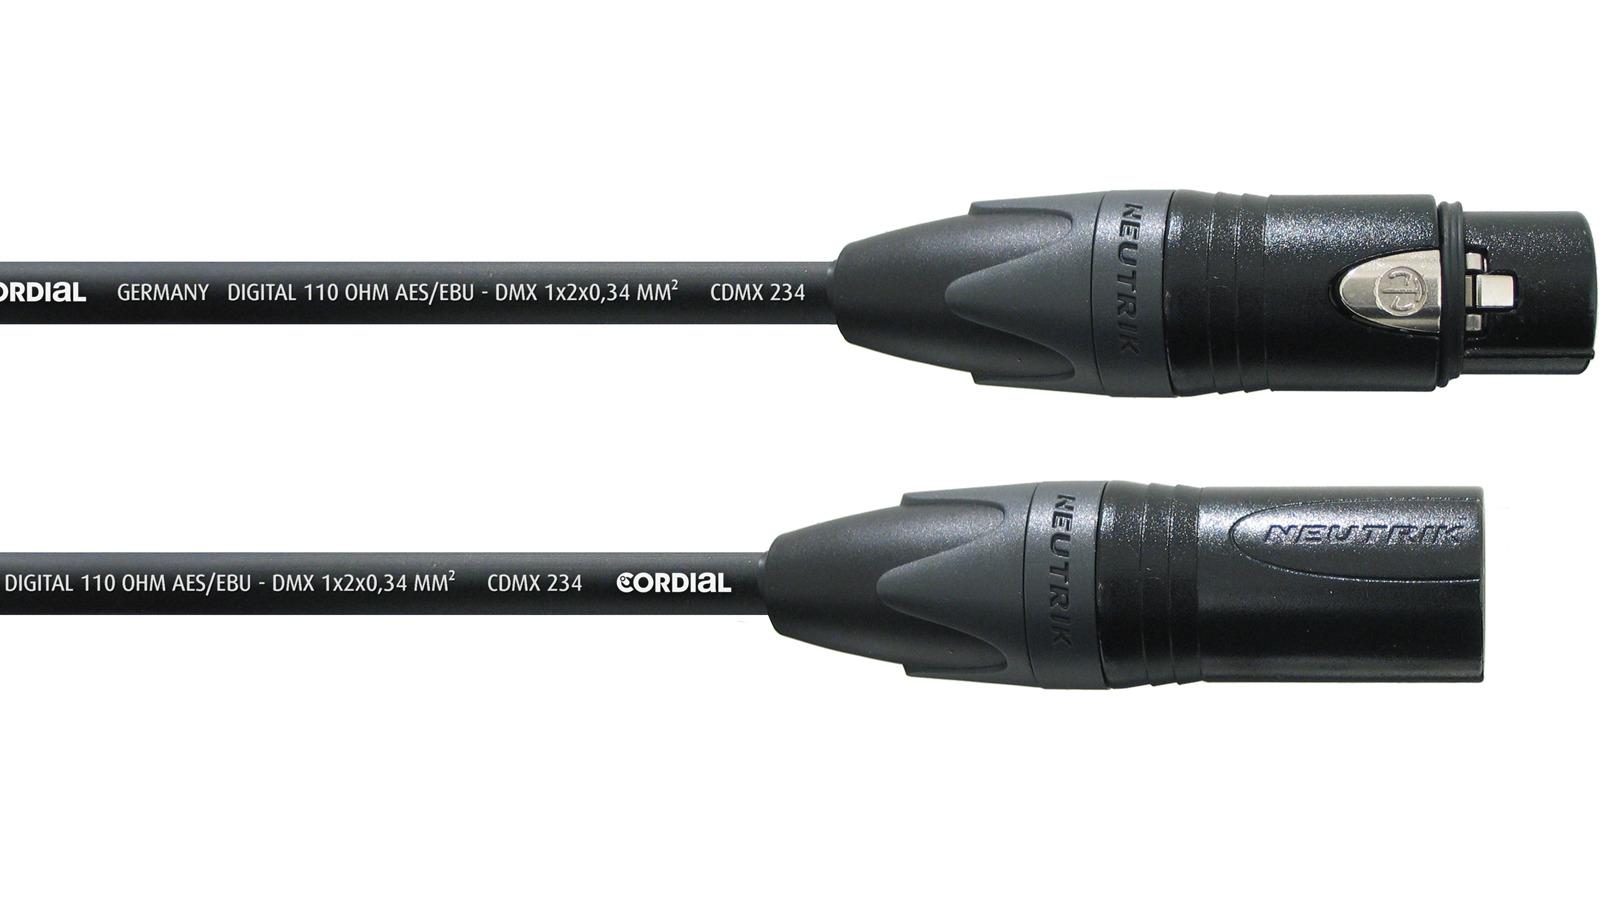 Cordial AES/EBU DMX Kabel 5 m CPD 5 FM